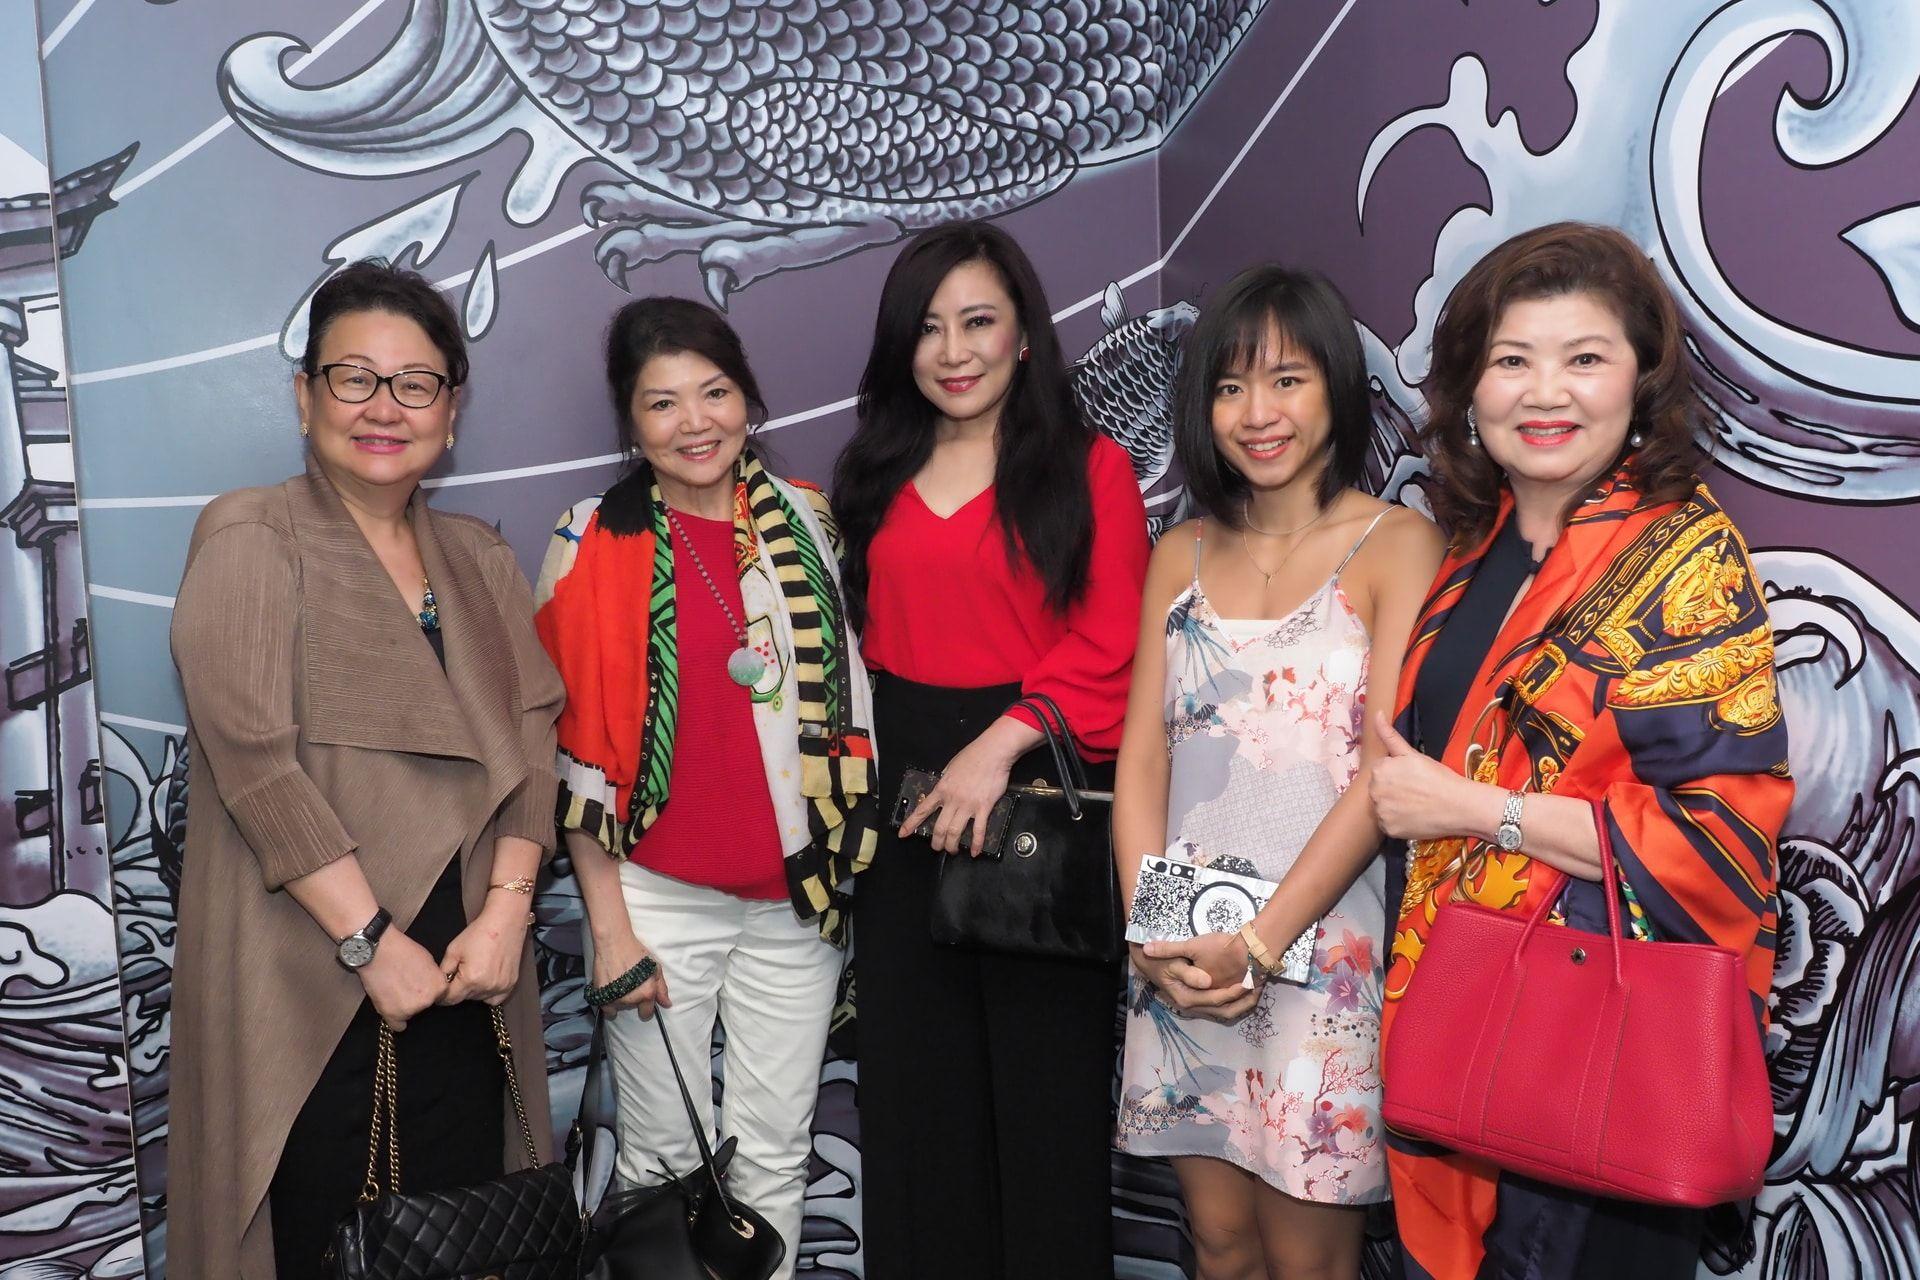 Dato' Joyce Yap, Bahlee New, Datin Reiss Tiara, Natalie Cheng and Datin Jenny Yap